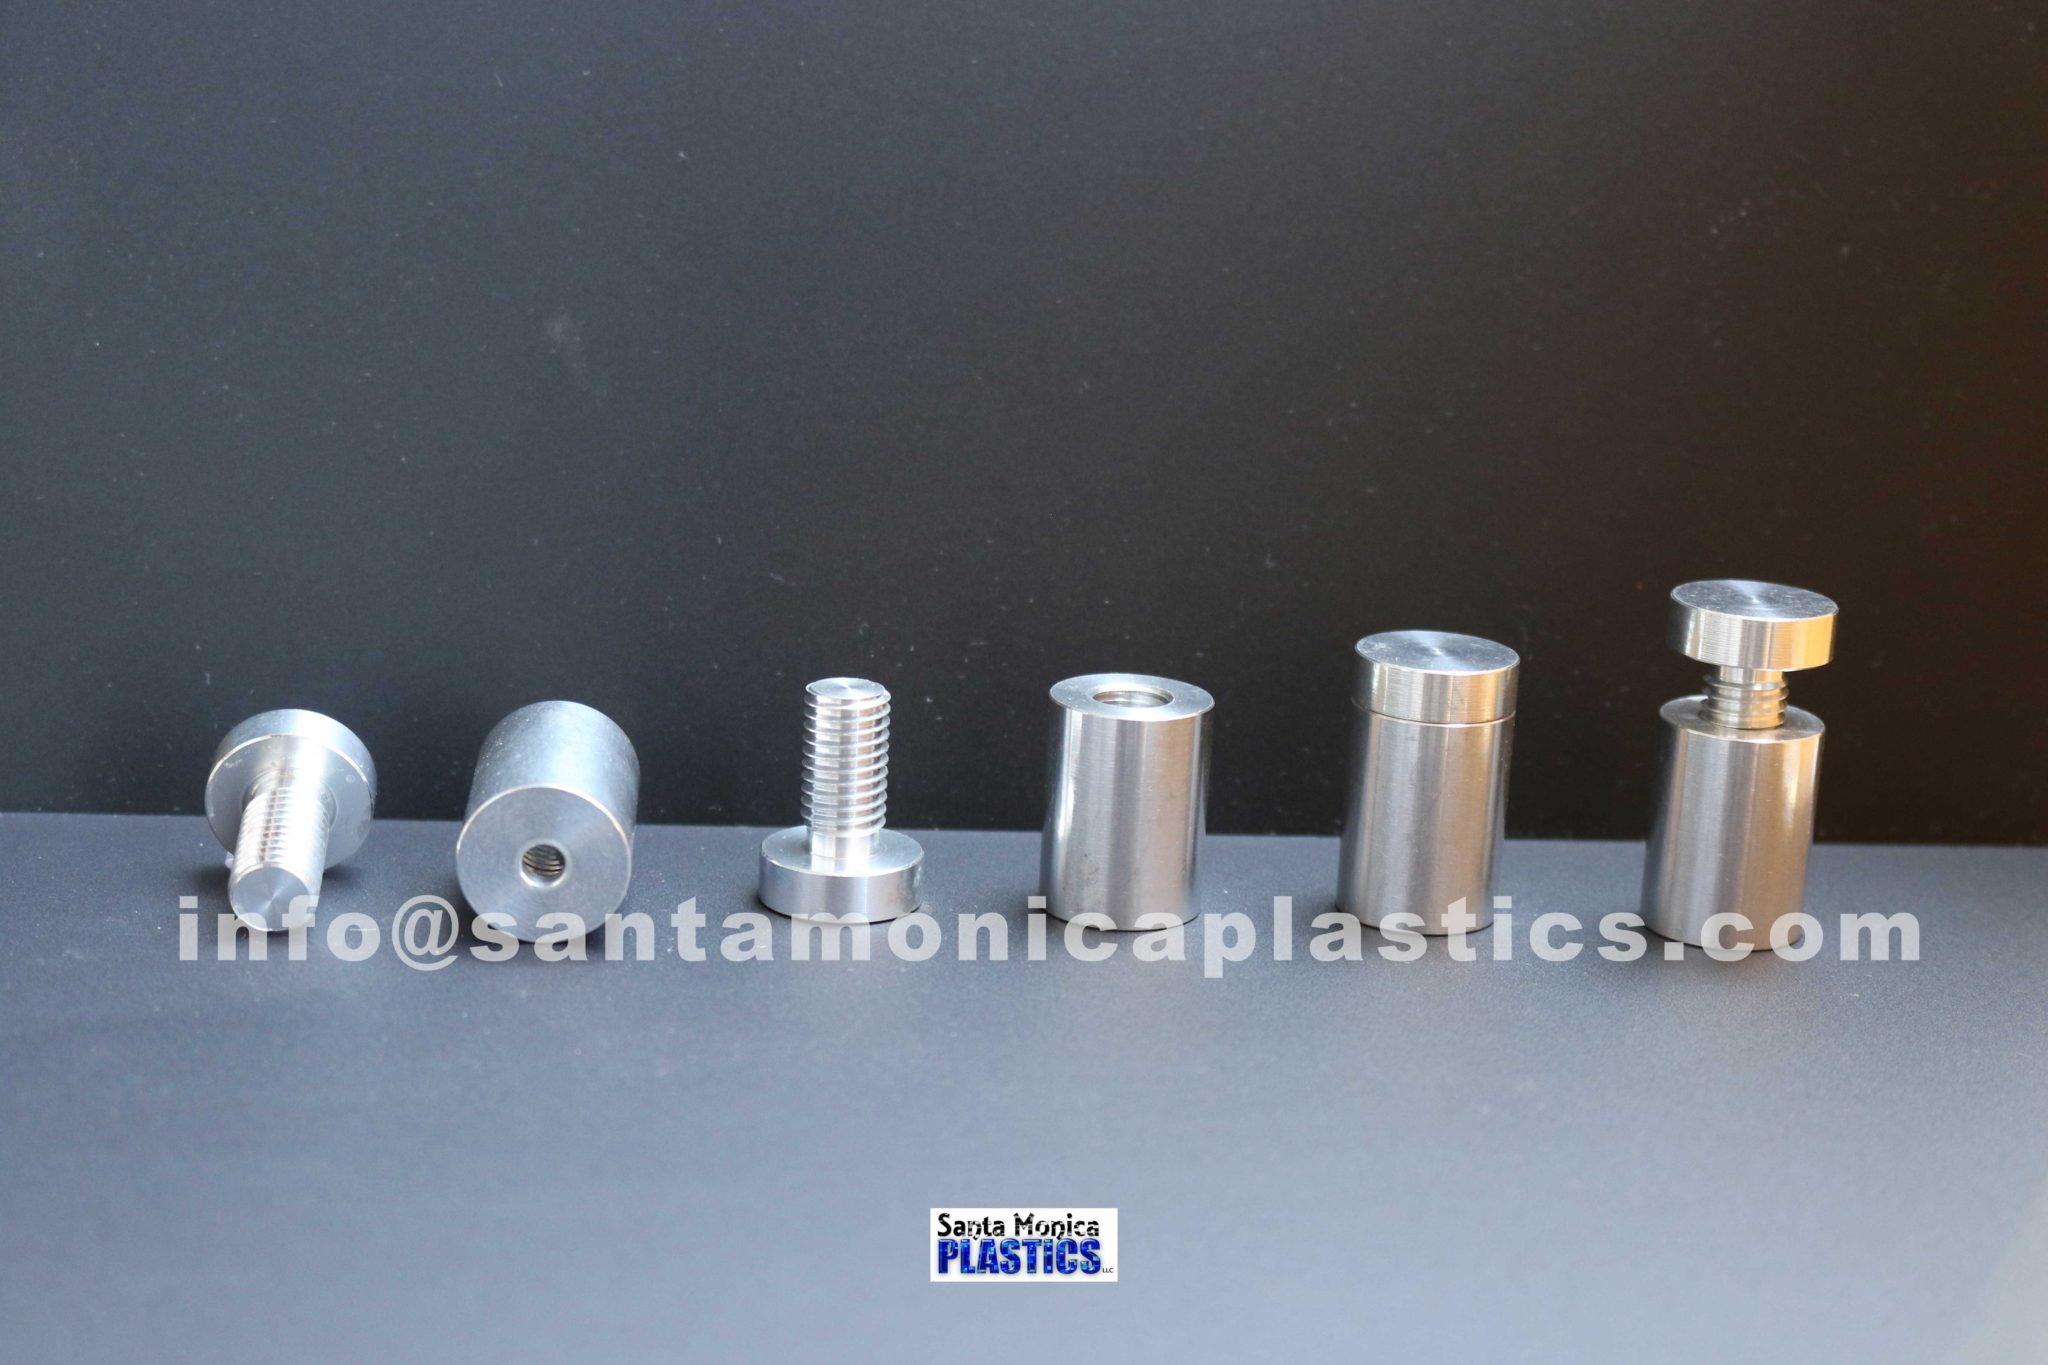 "Aluminum Standoffs #5 Size 0.75"" X 1.25"" (4 Pieces)"